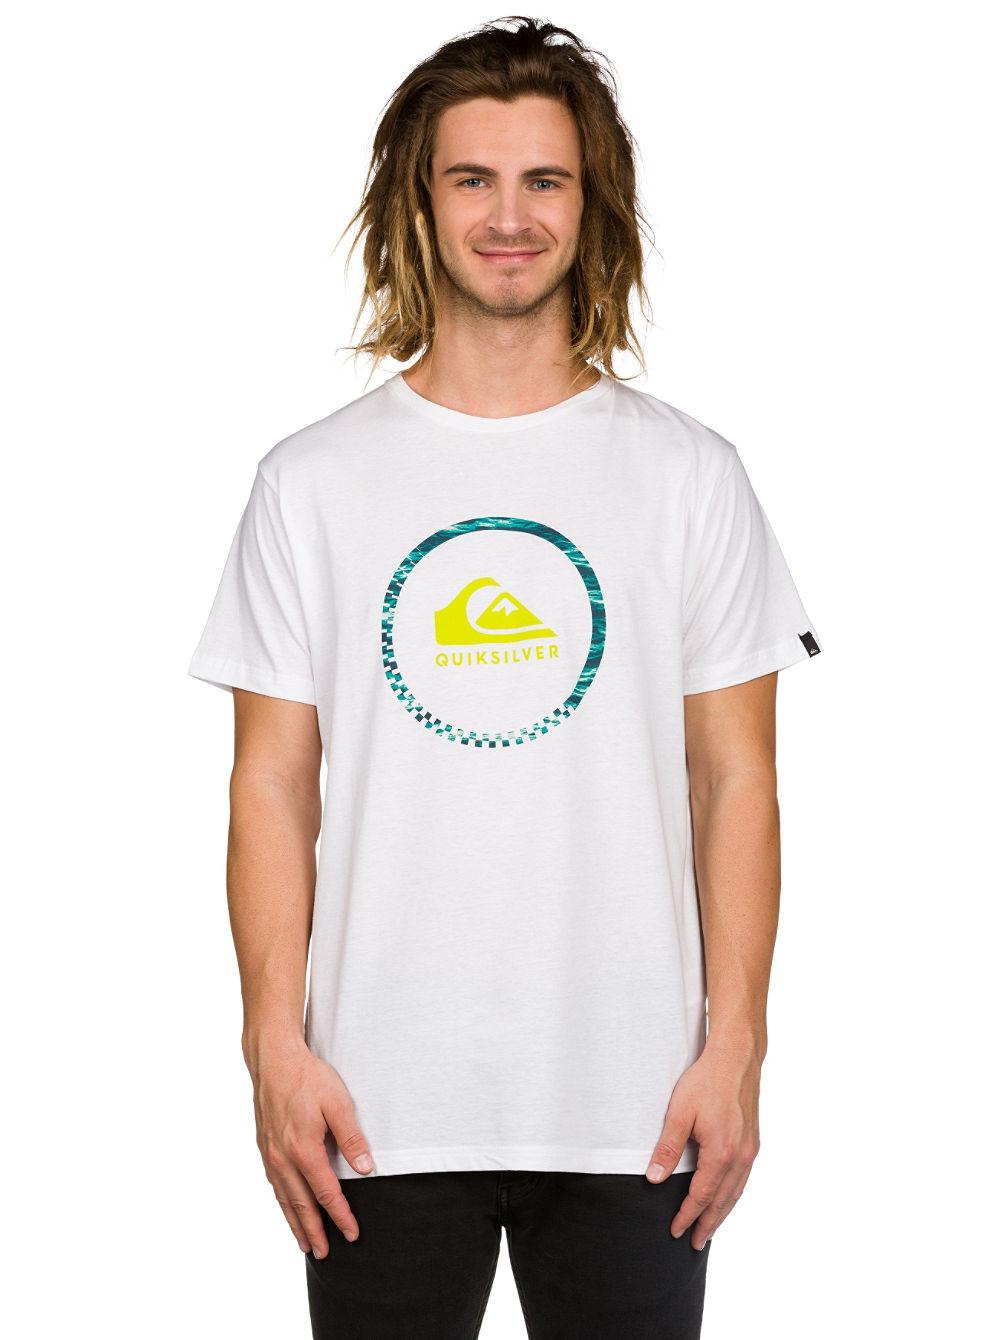 quiksilver-classic-active-logo-30-t-shirt